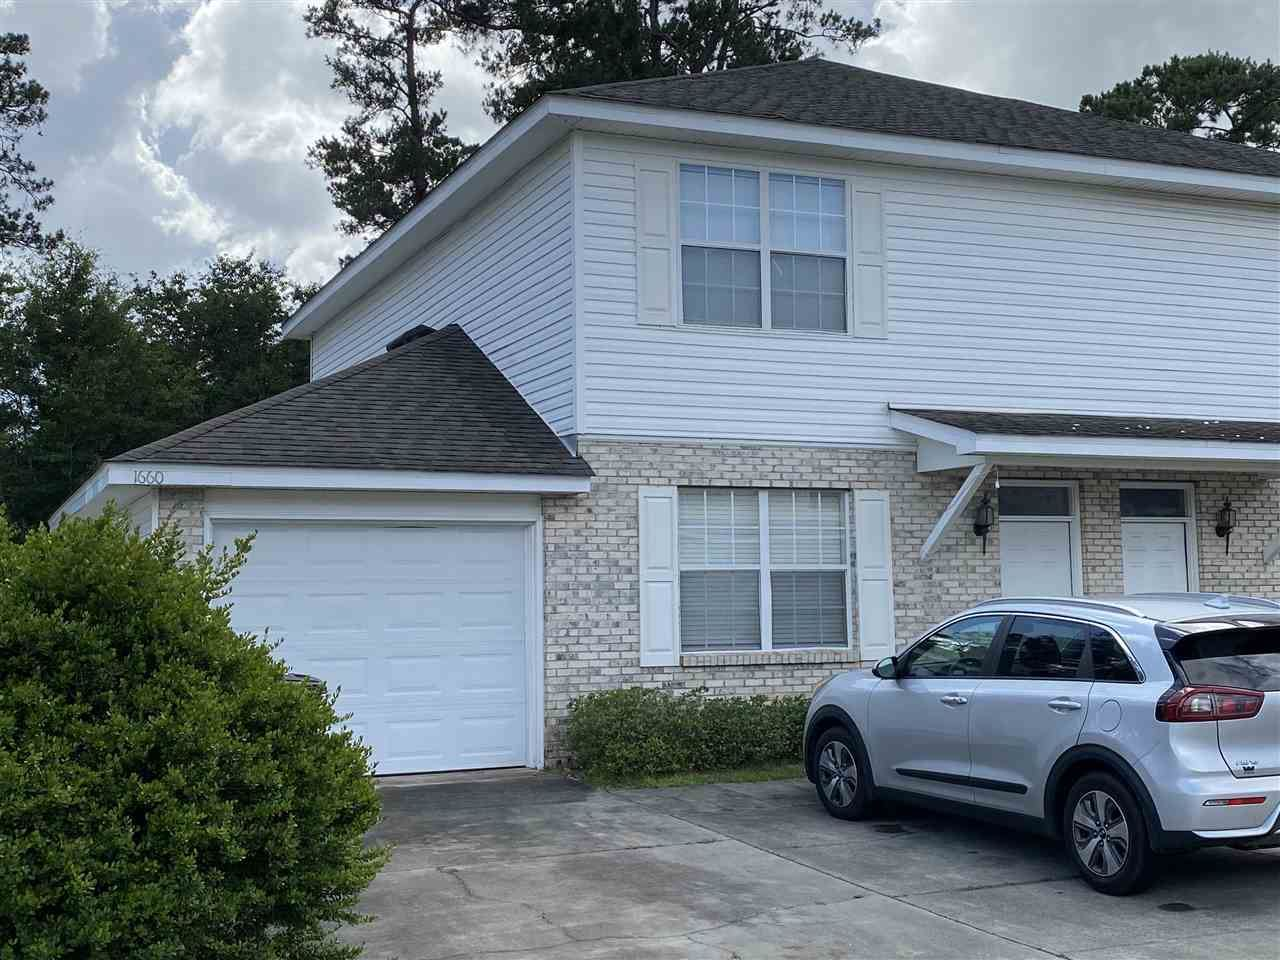 1660 Corey Wood Circle, Tallahassee, FL 32304 - MLS#: 333320